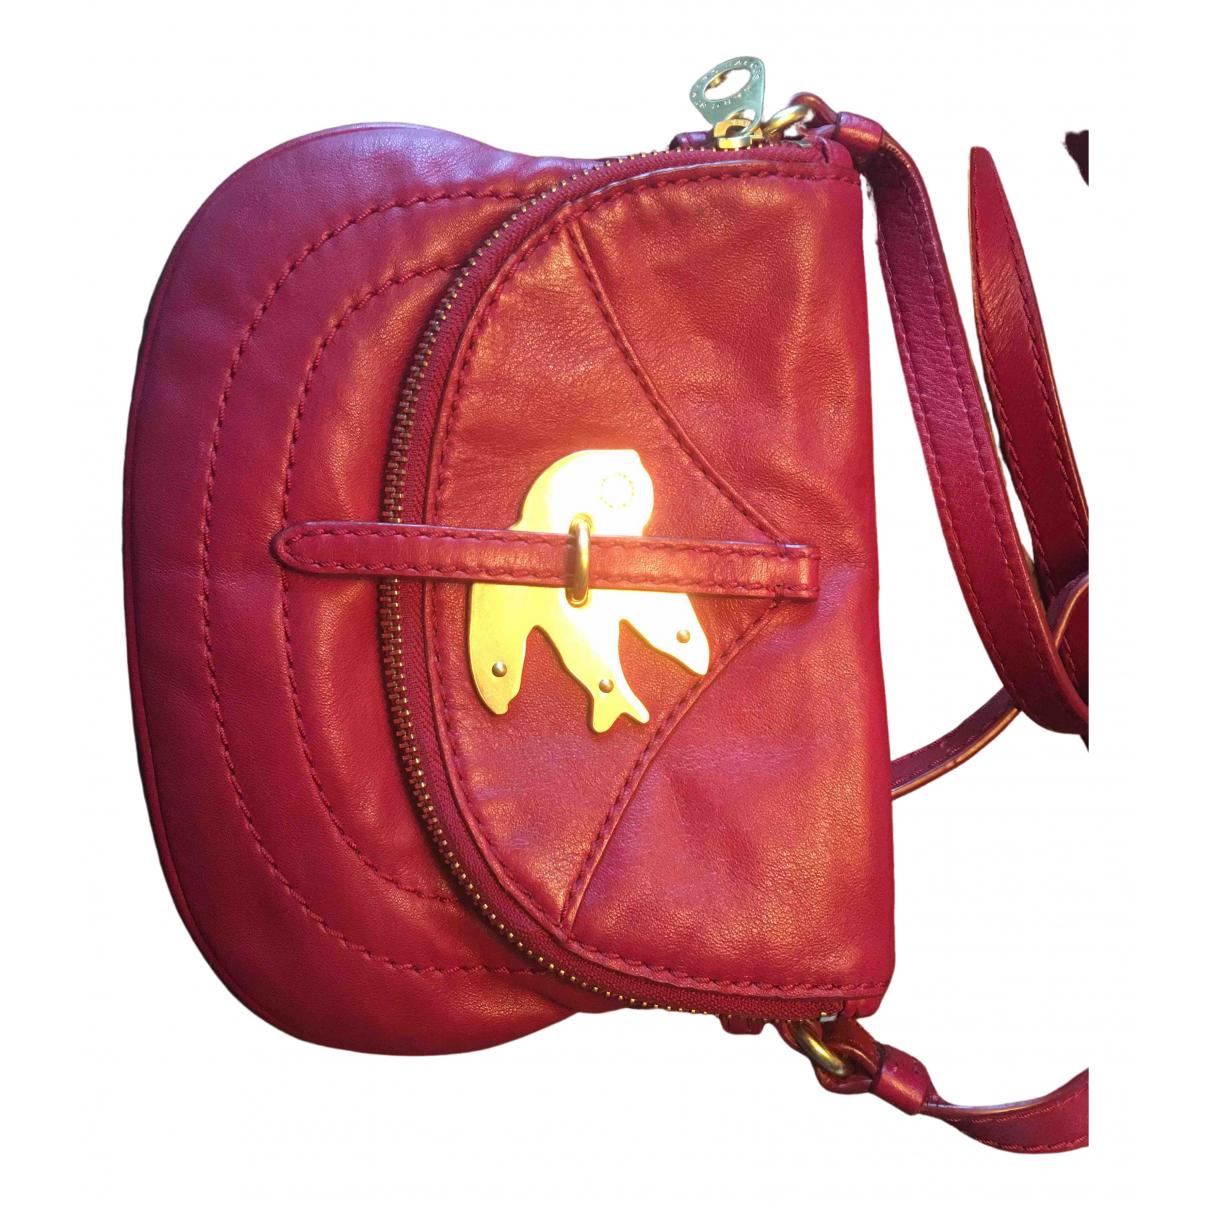 Marc By Marc Jacobs N Burgundy Leather handbag for Women N